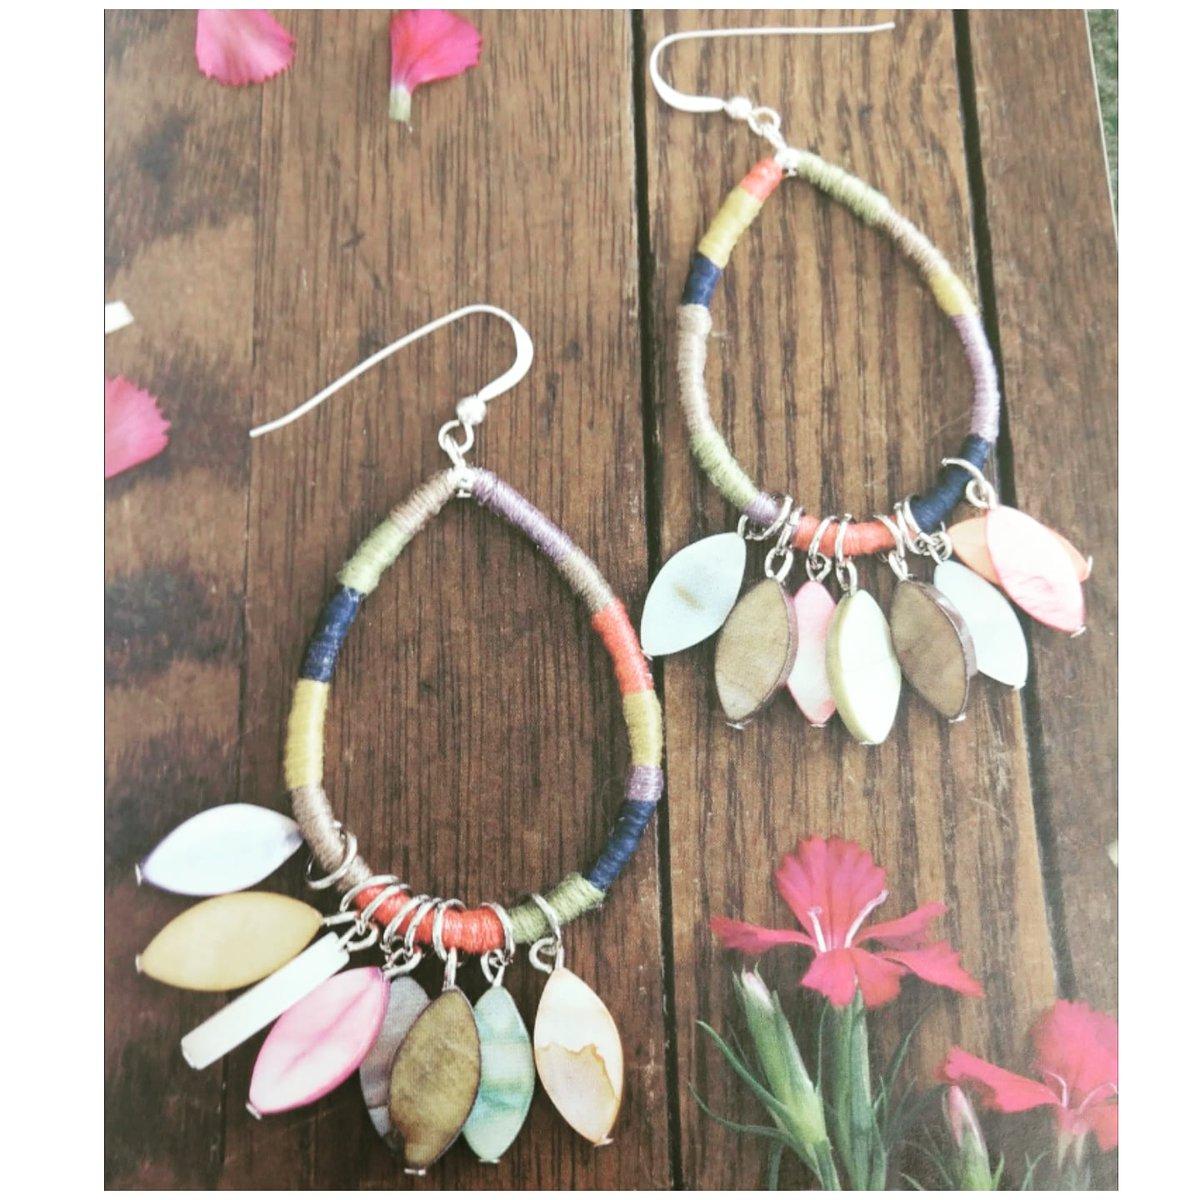 Fashion-forward #earrings for all: all occasions, all ages & all attitudes  Nos encantan los aretes de colores para la ciudad    #stylish #handmade #jewlery #hechoamano #earringlove #jewelryblog #joyas #fashionista #arte #gifts #regalo #fashionblog